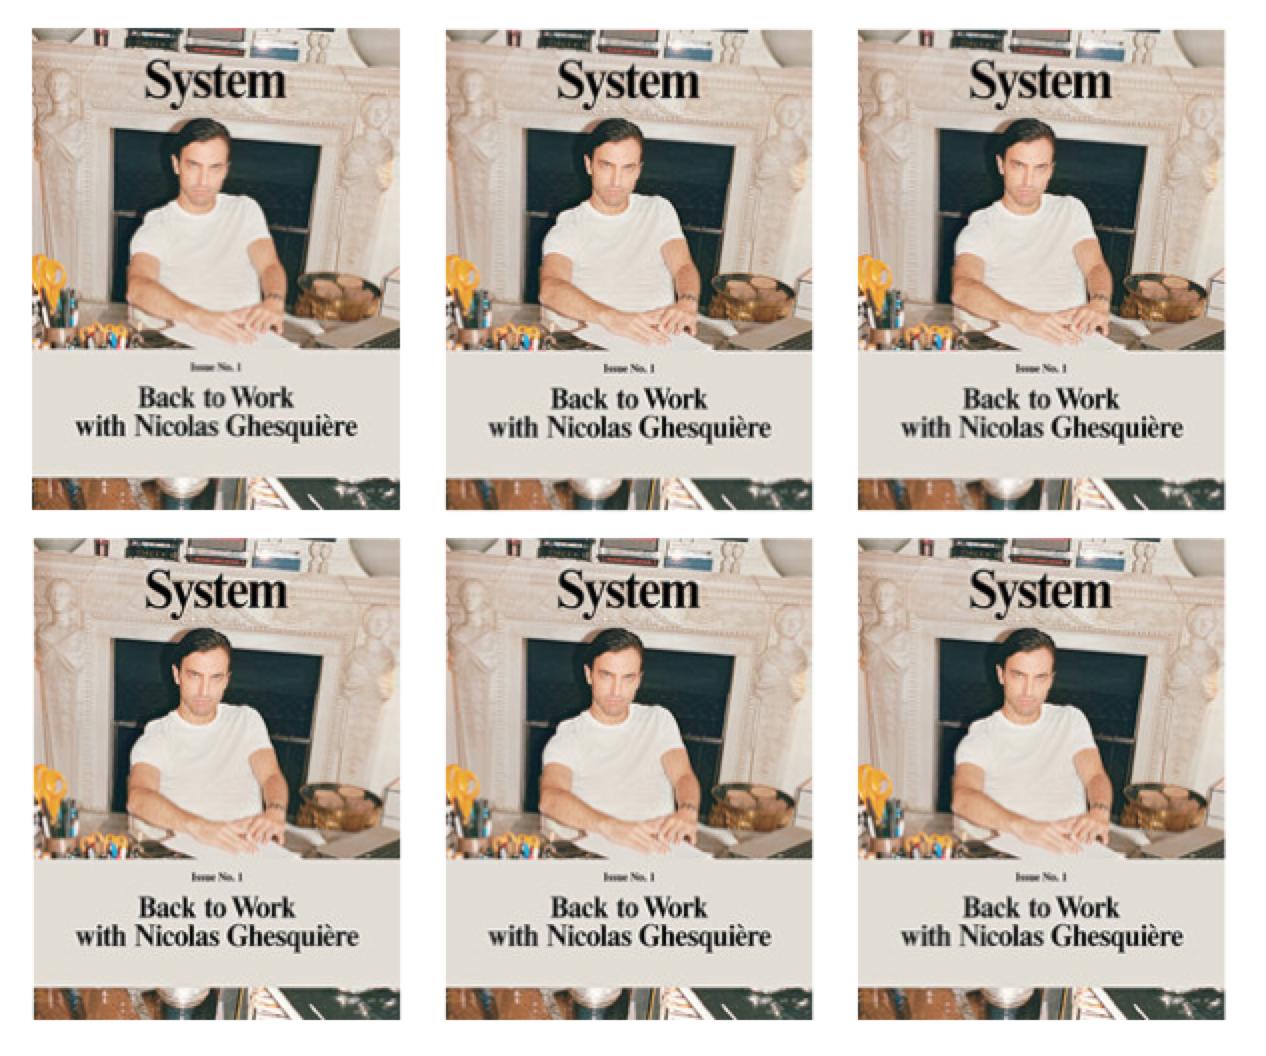 Image: System